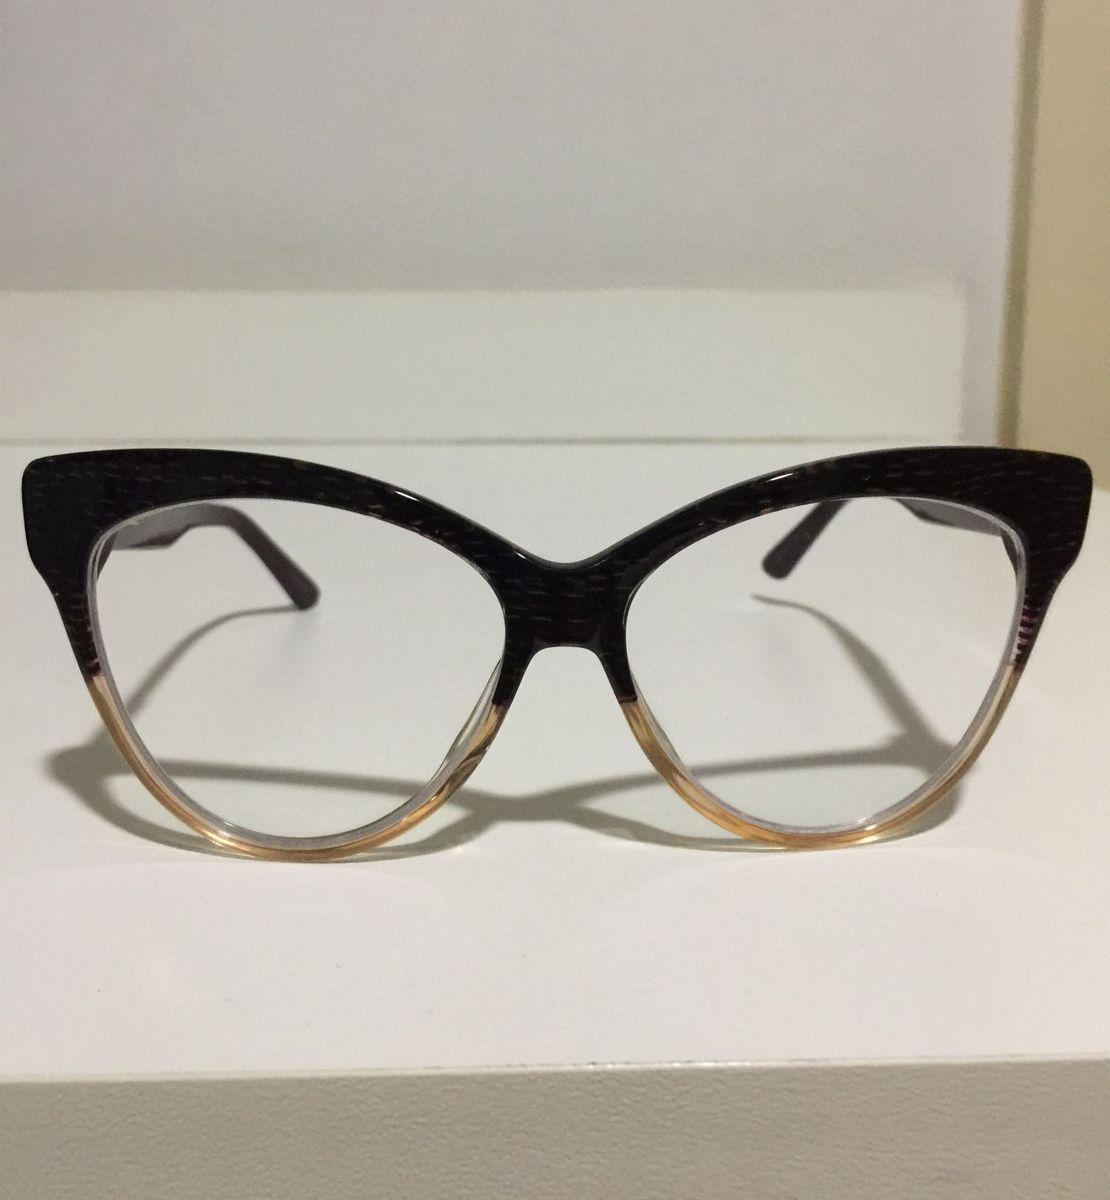 8ec4bb1ff óculos gatinho chilli beans - óculos chilli beans.  Czm6ly9wag90b3muzw5qb2vplmnvbs5ici9wcm9kdwn0cy81ndq4njcvyzbjymqynje4ngi3owniody4ymflngu3odq3yjqzmjeuanbn